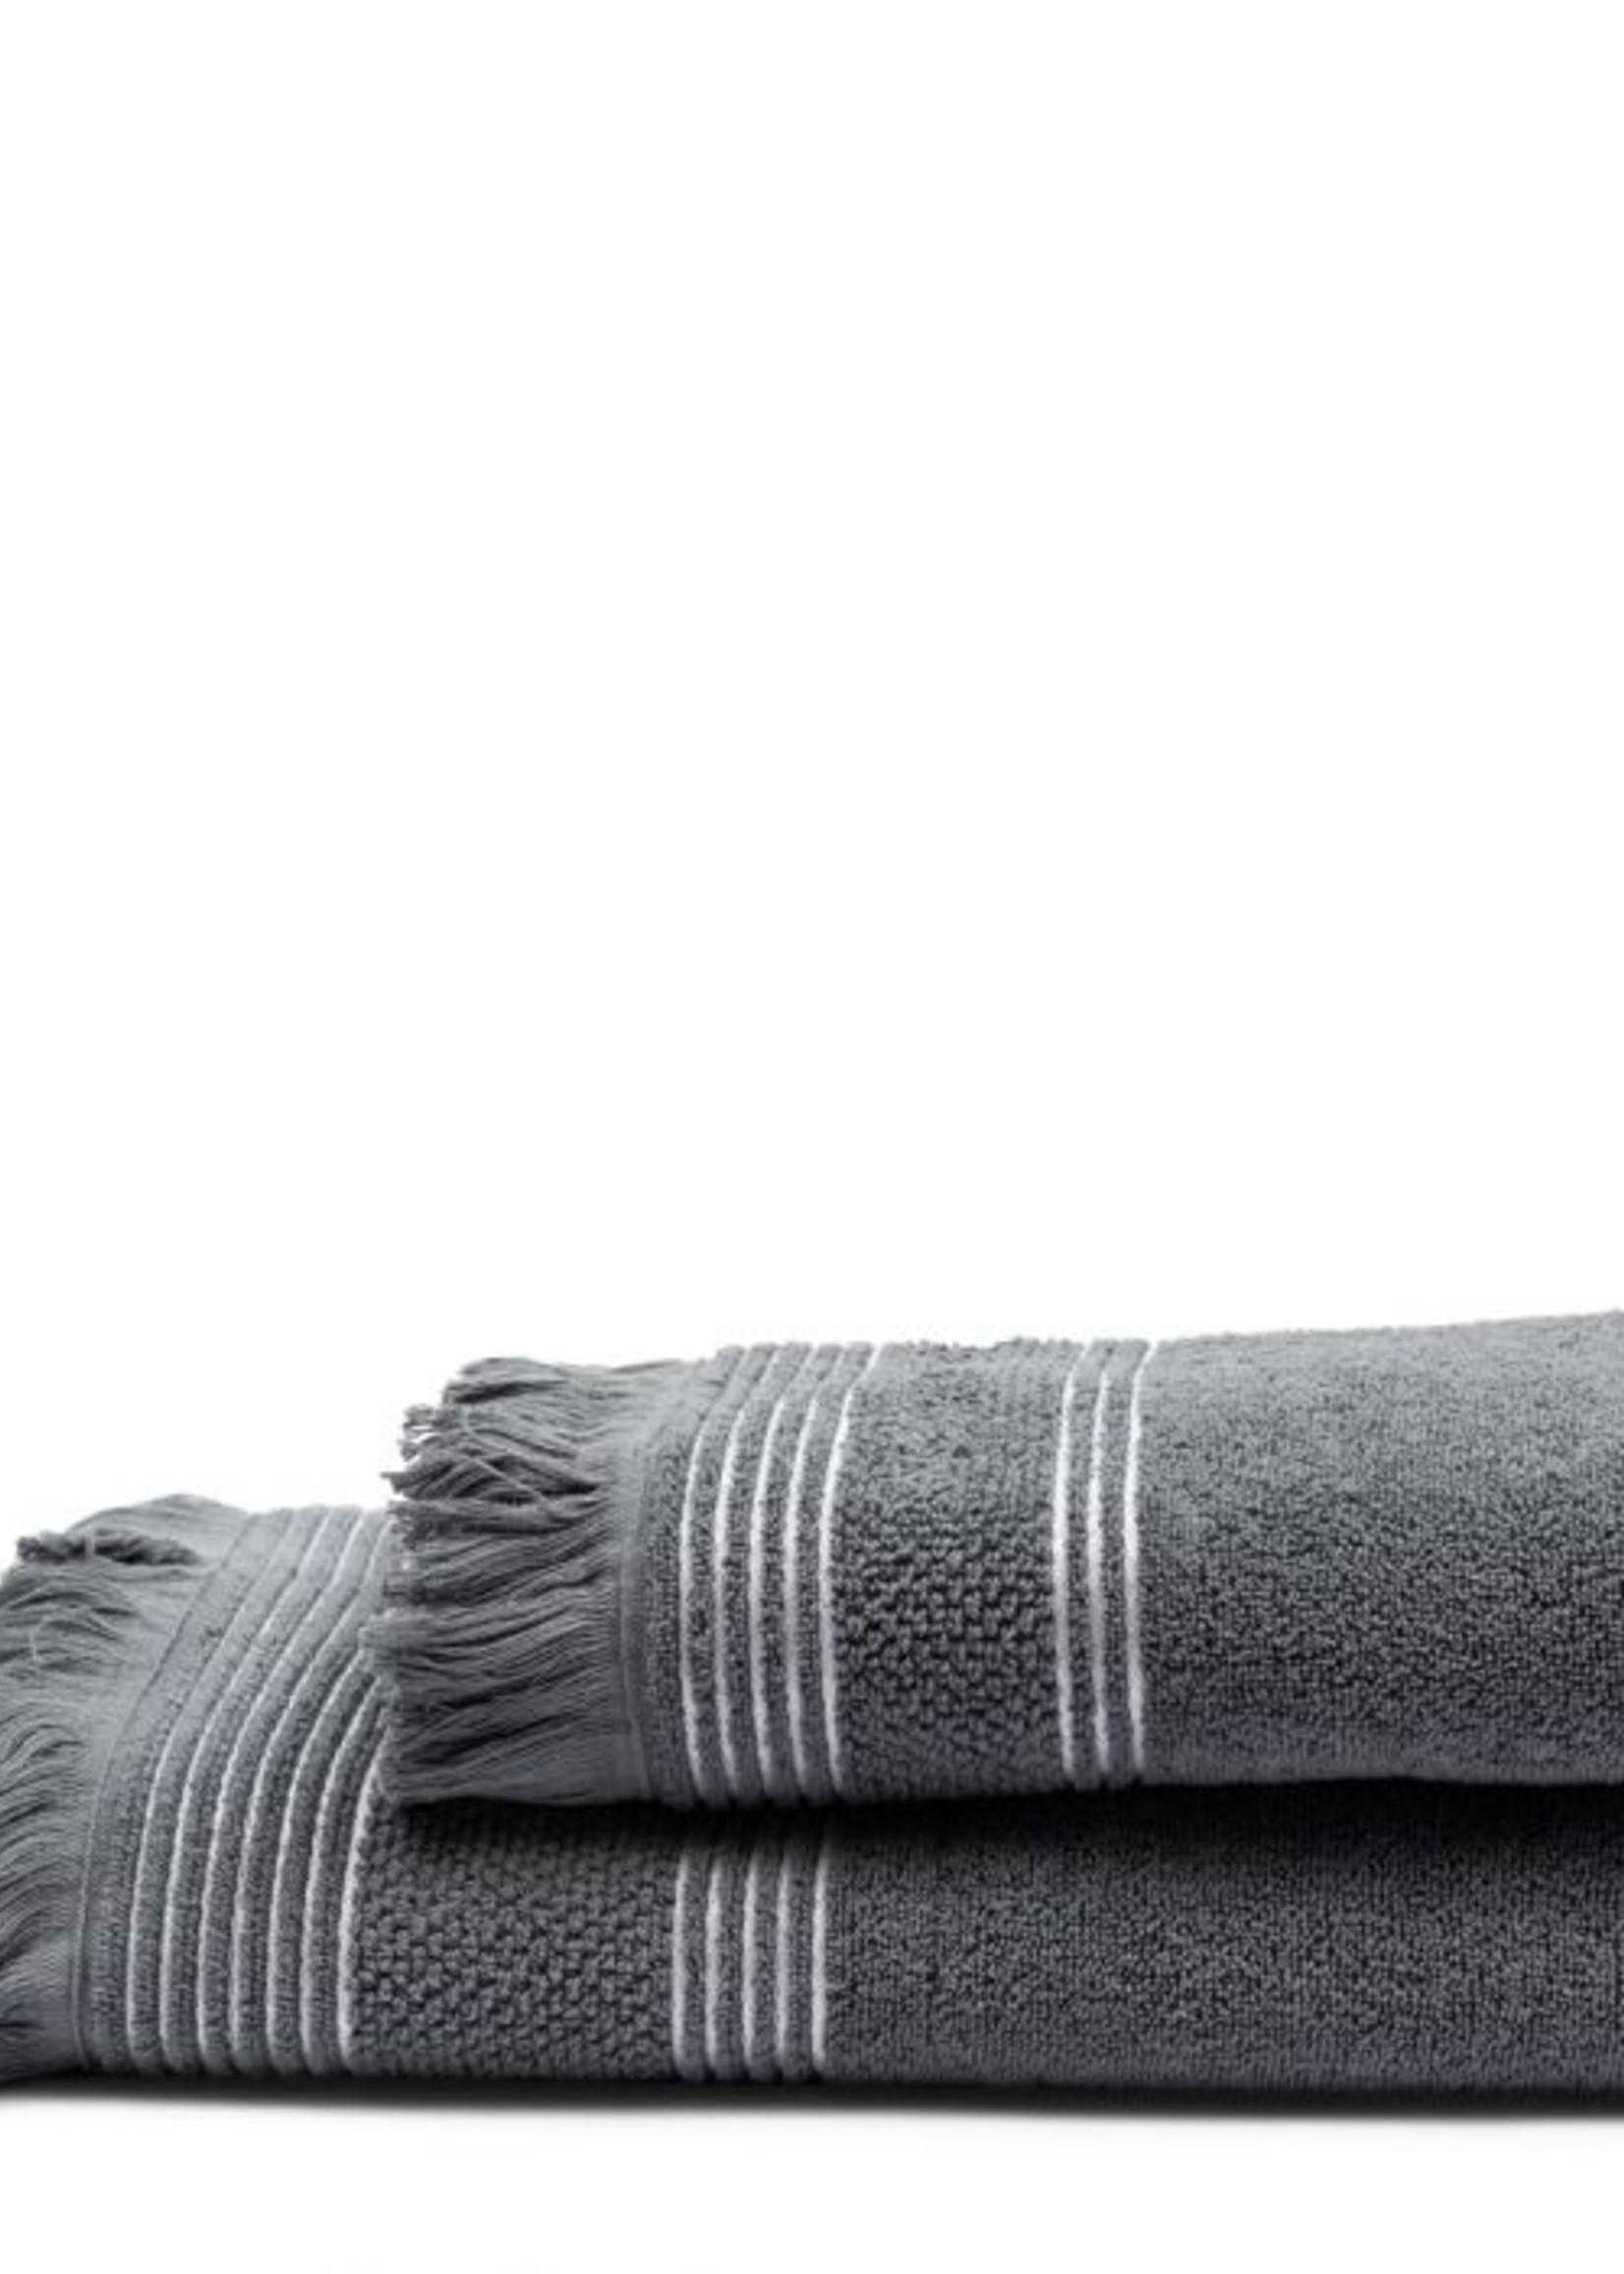 Riviera Maison Serene Towel anthracite 140x70